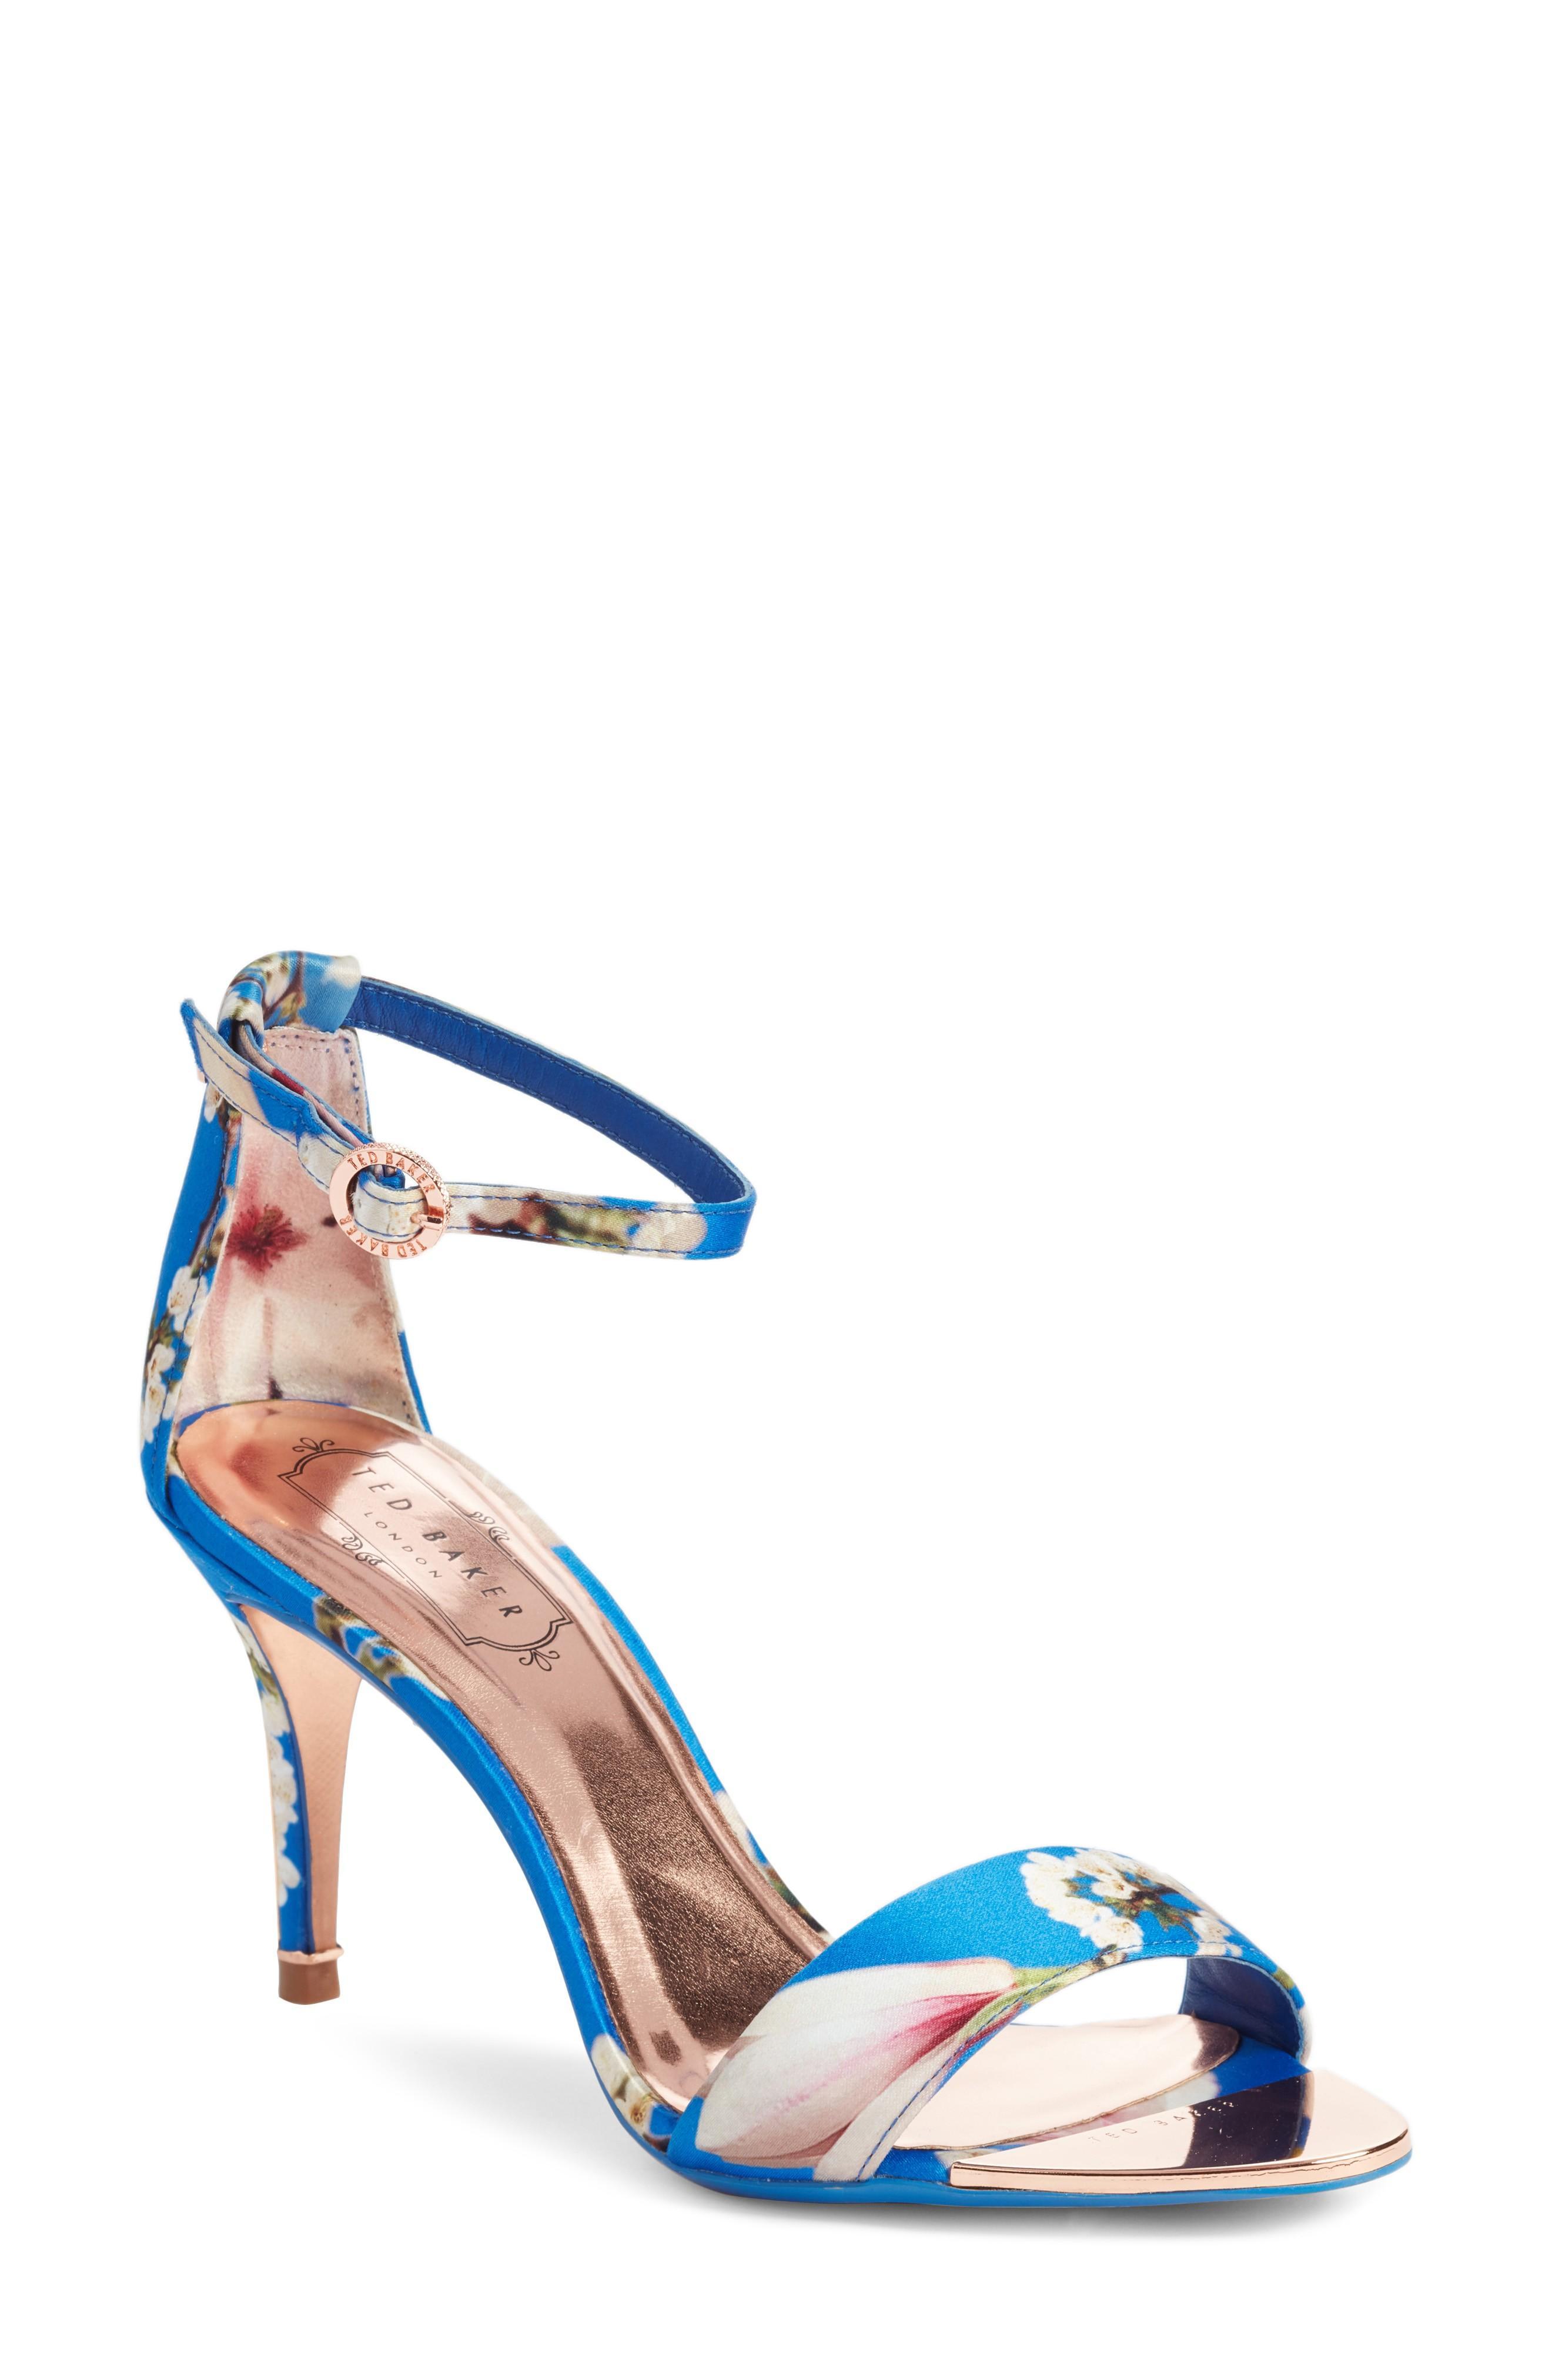 f0c2d30c9fd Ted Baker Mavbe Ankle Strap Sandal In Blue Harmony Print